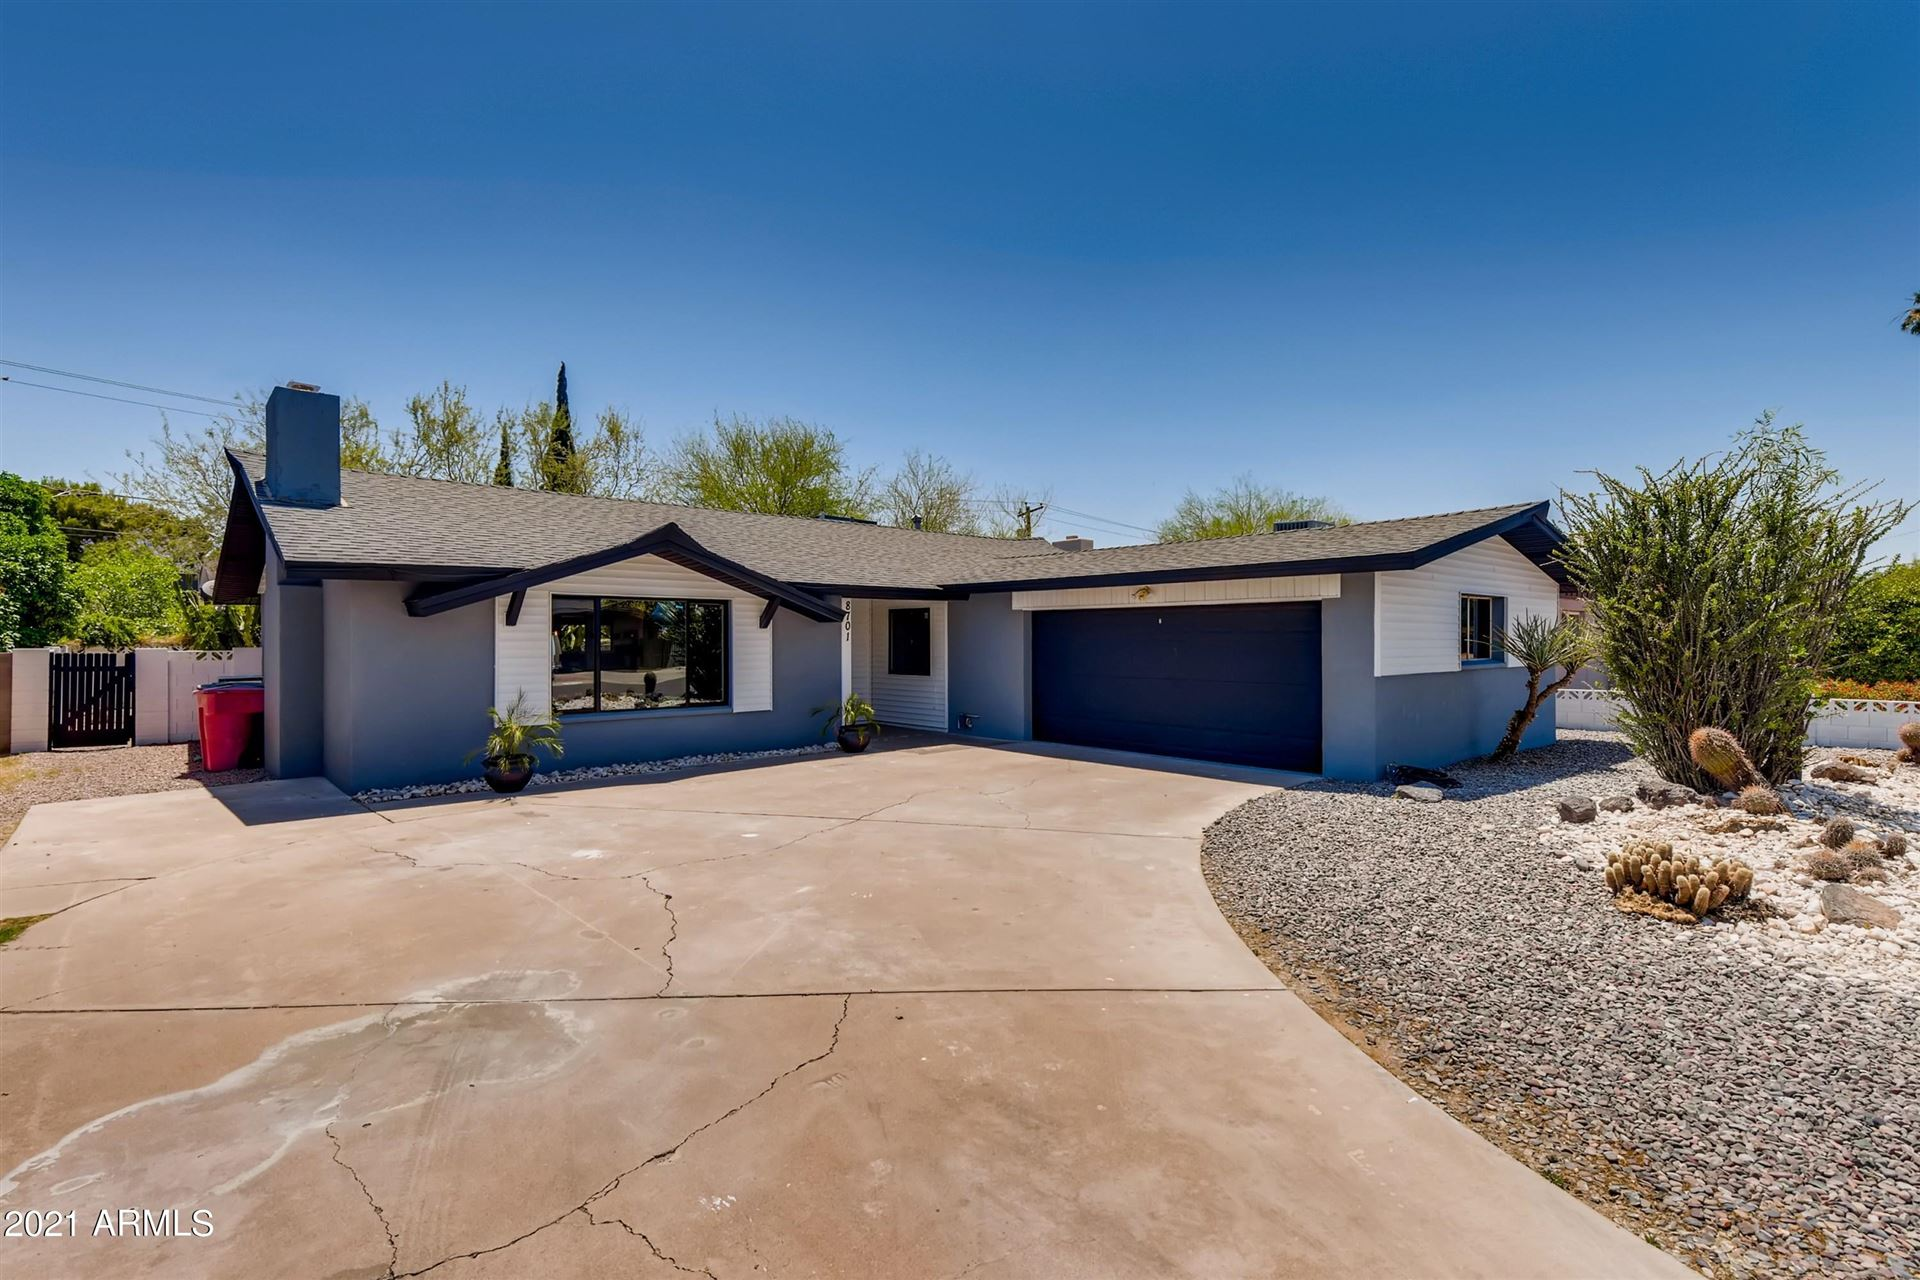 8701 E MONTEBELLO Avenue, Scottsdale, AZ 85250 - #: 6226034